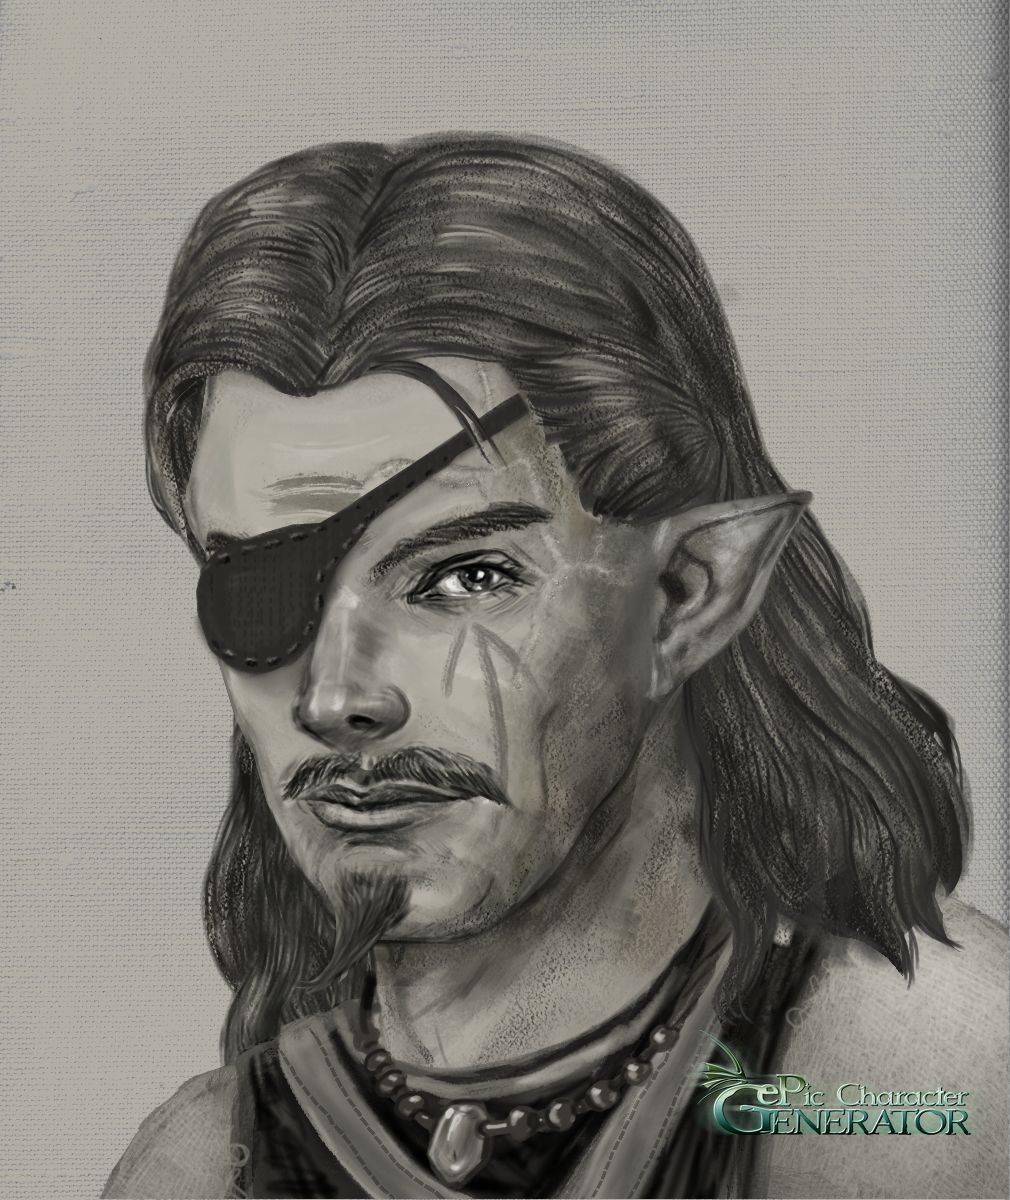 ePic Character Generator Season 3 Male Portrait Screenshot 01